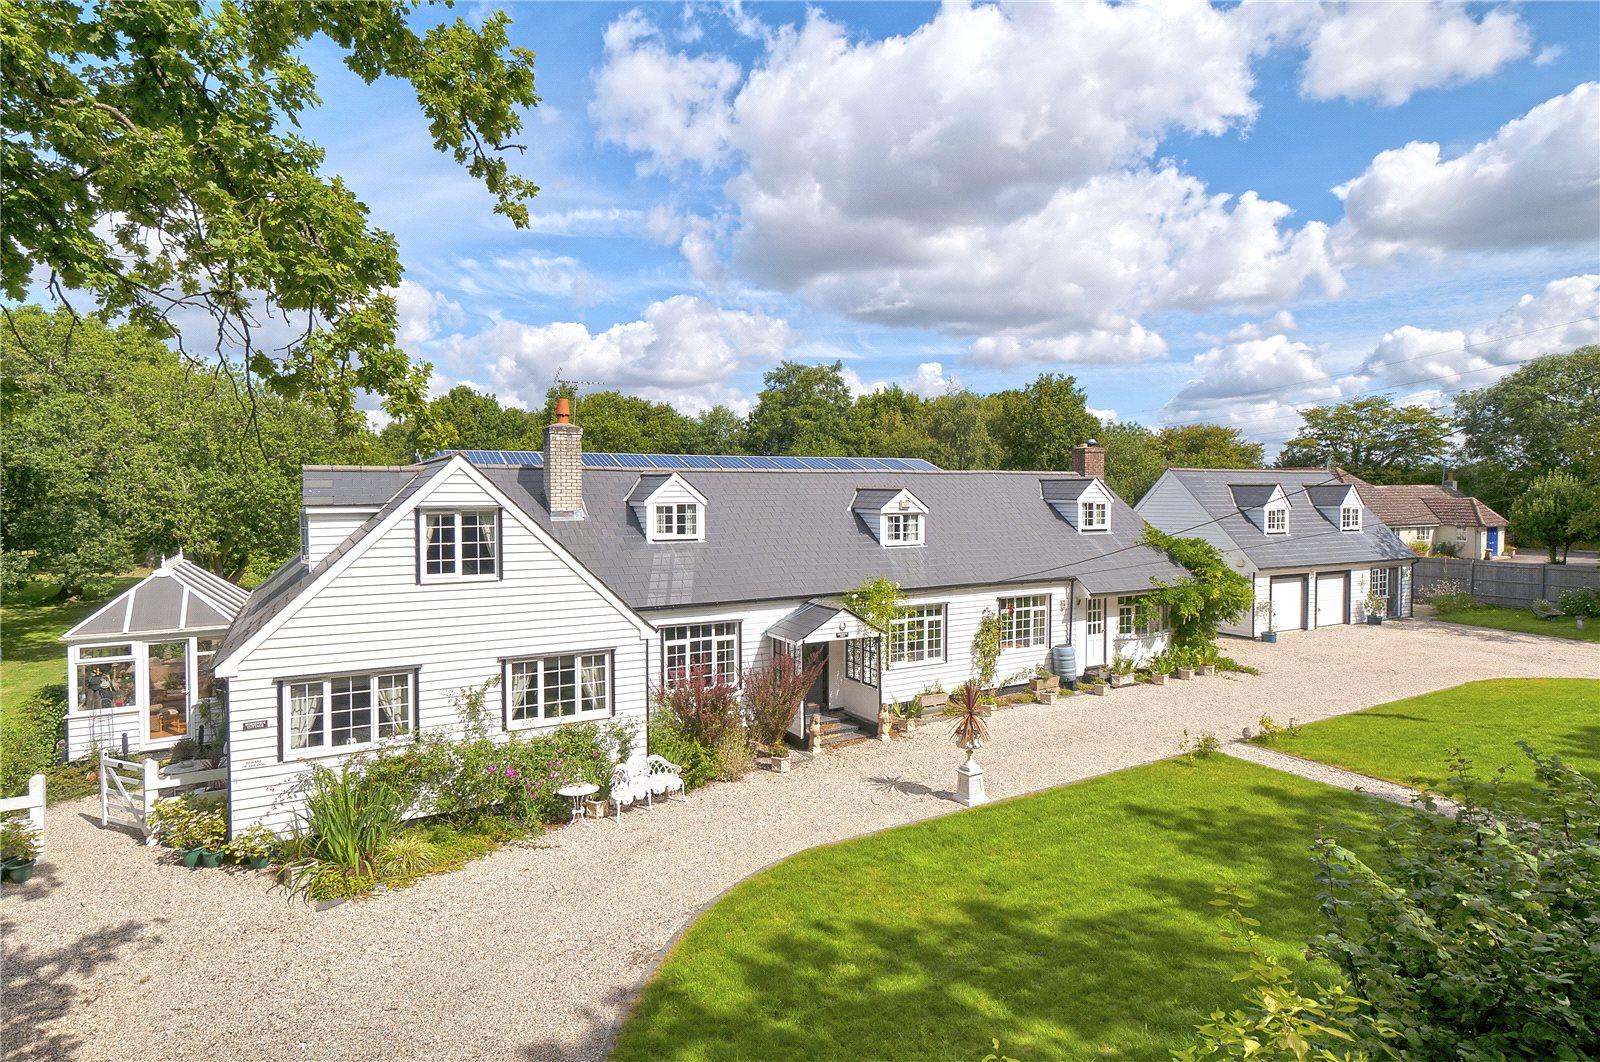 Villa per Vendita alle ore Ruckinge, Ashford, Kent, TN26 Ashford, Inghilterra